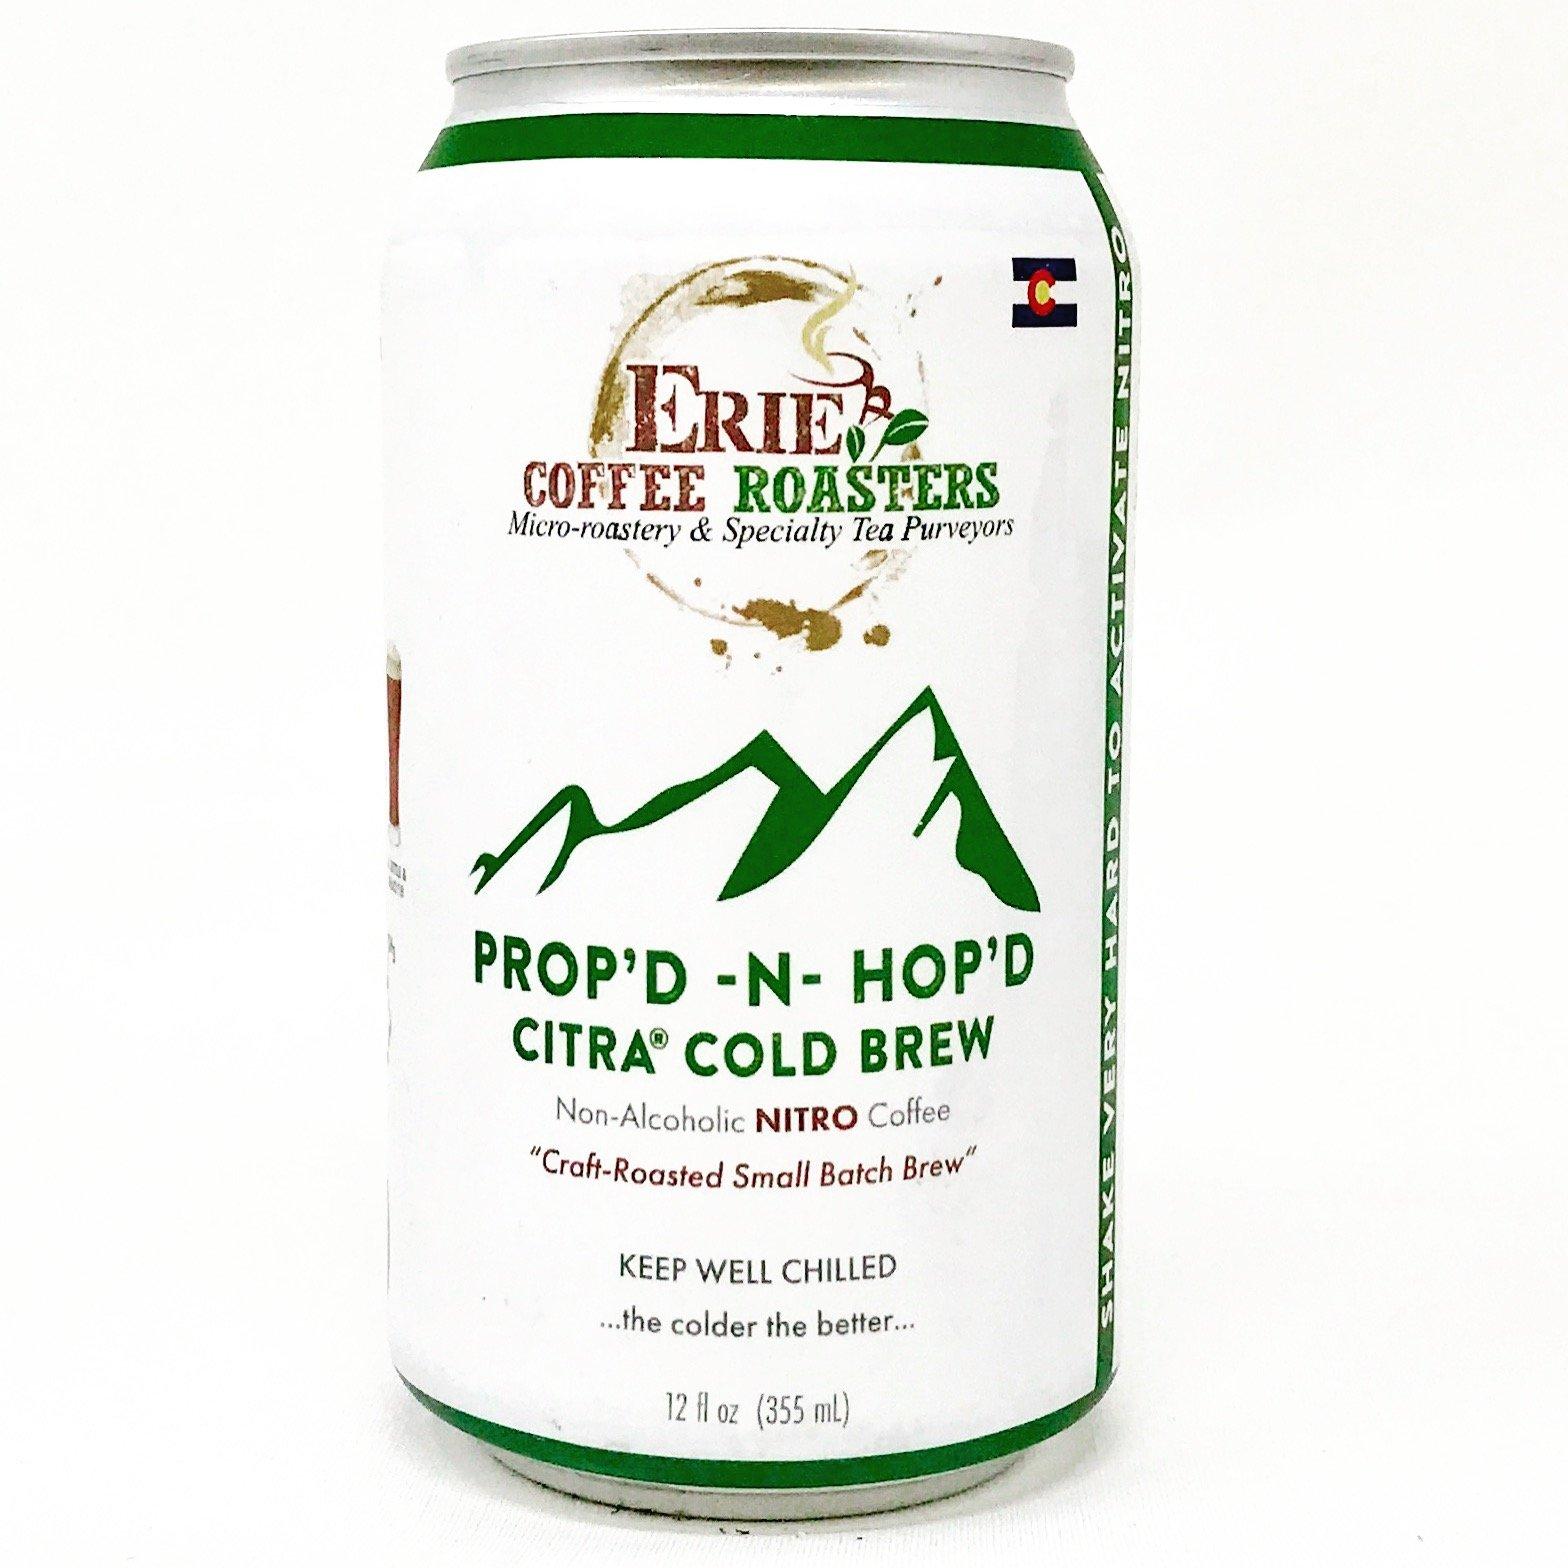 Prop'd-N-Hop'd 4-Pack 12oz Cans, Nitro Citra-Hopped Cold Brew